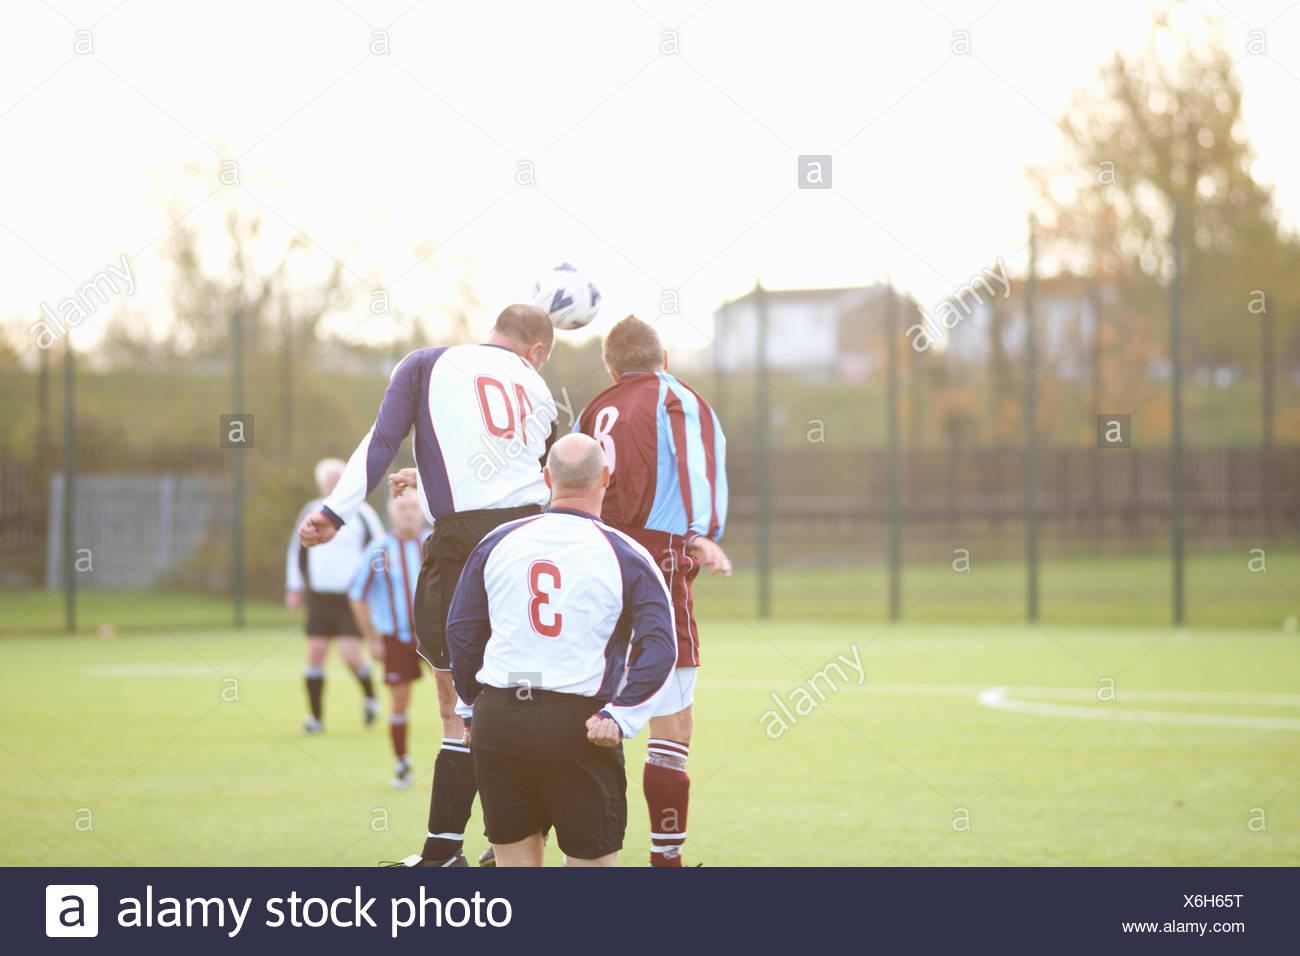 Football player heading ball - Stock Image